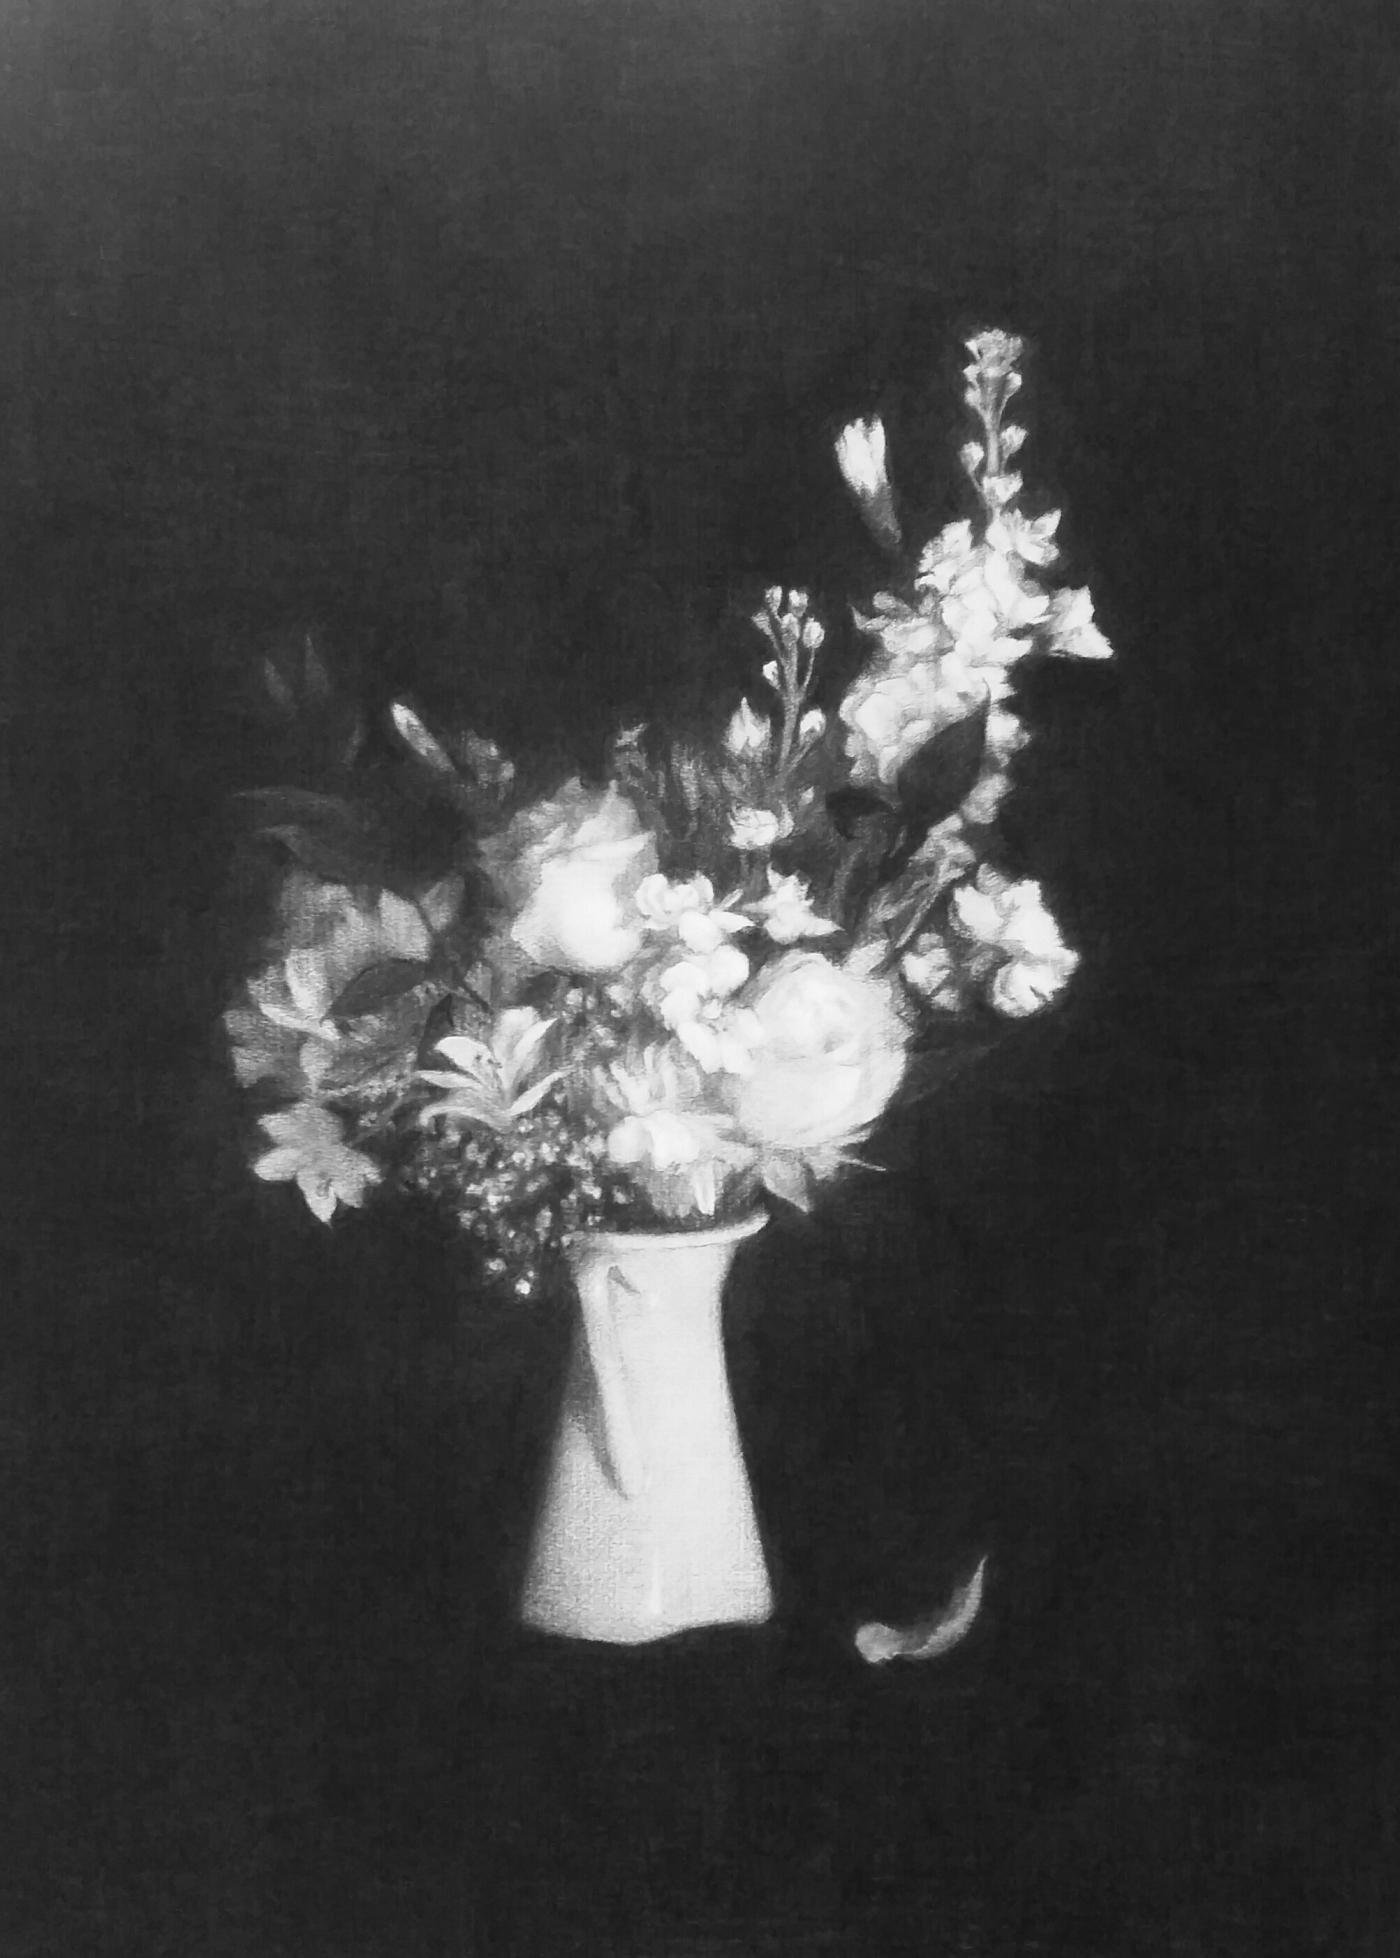 2015-Drawing_Flowers_Dorian Gray_02.jpg